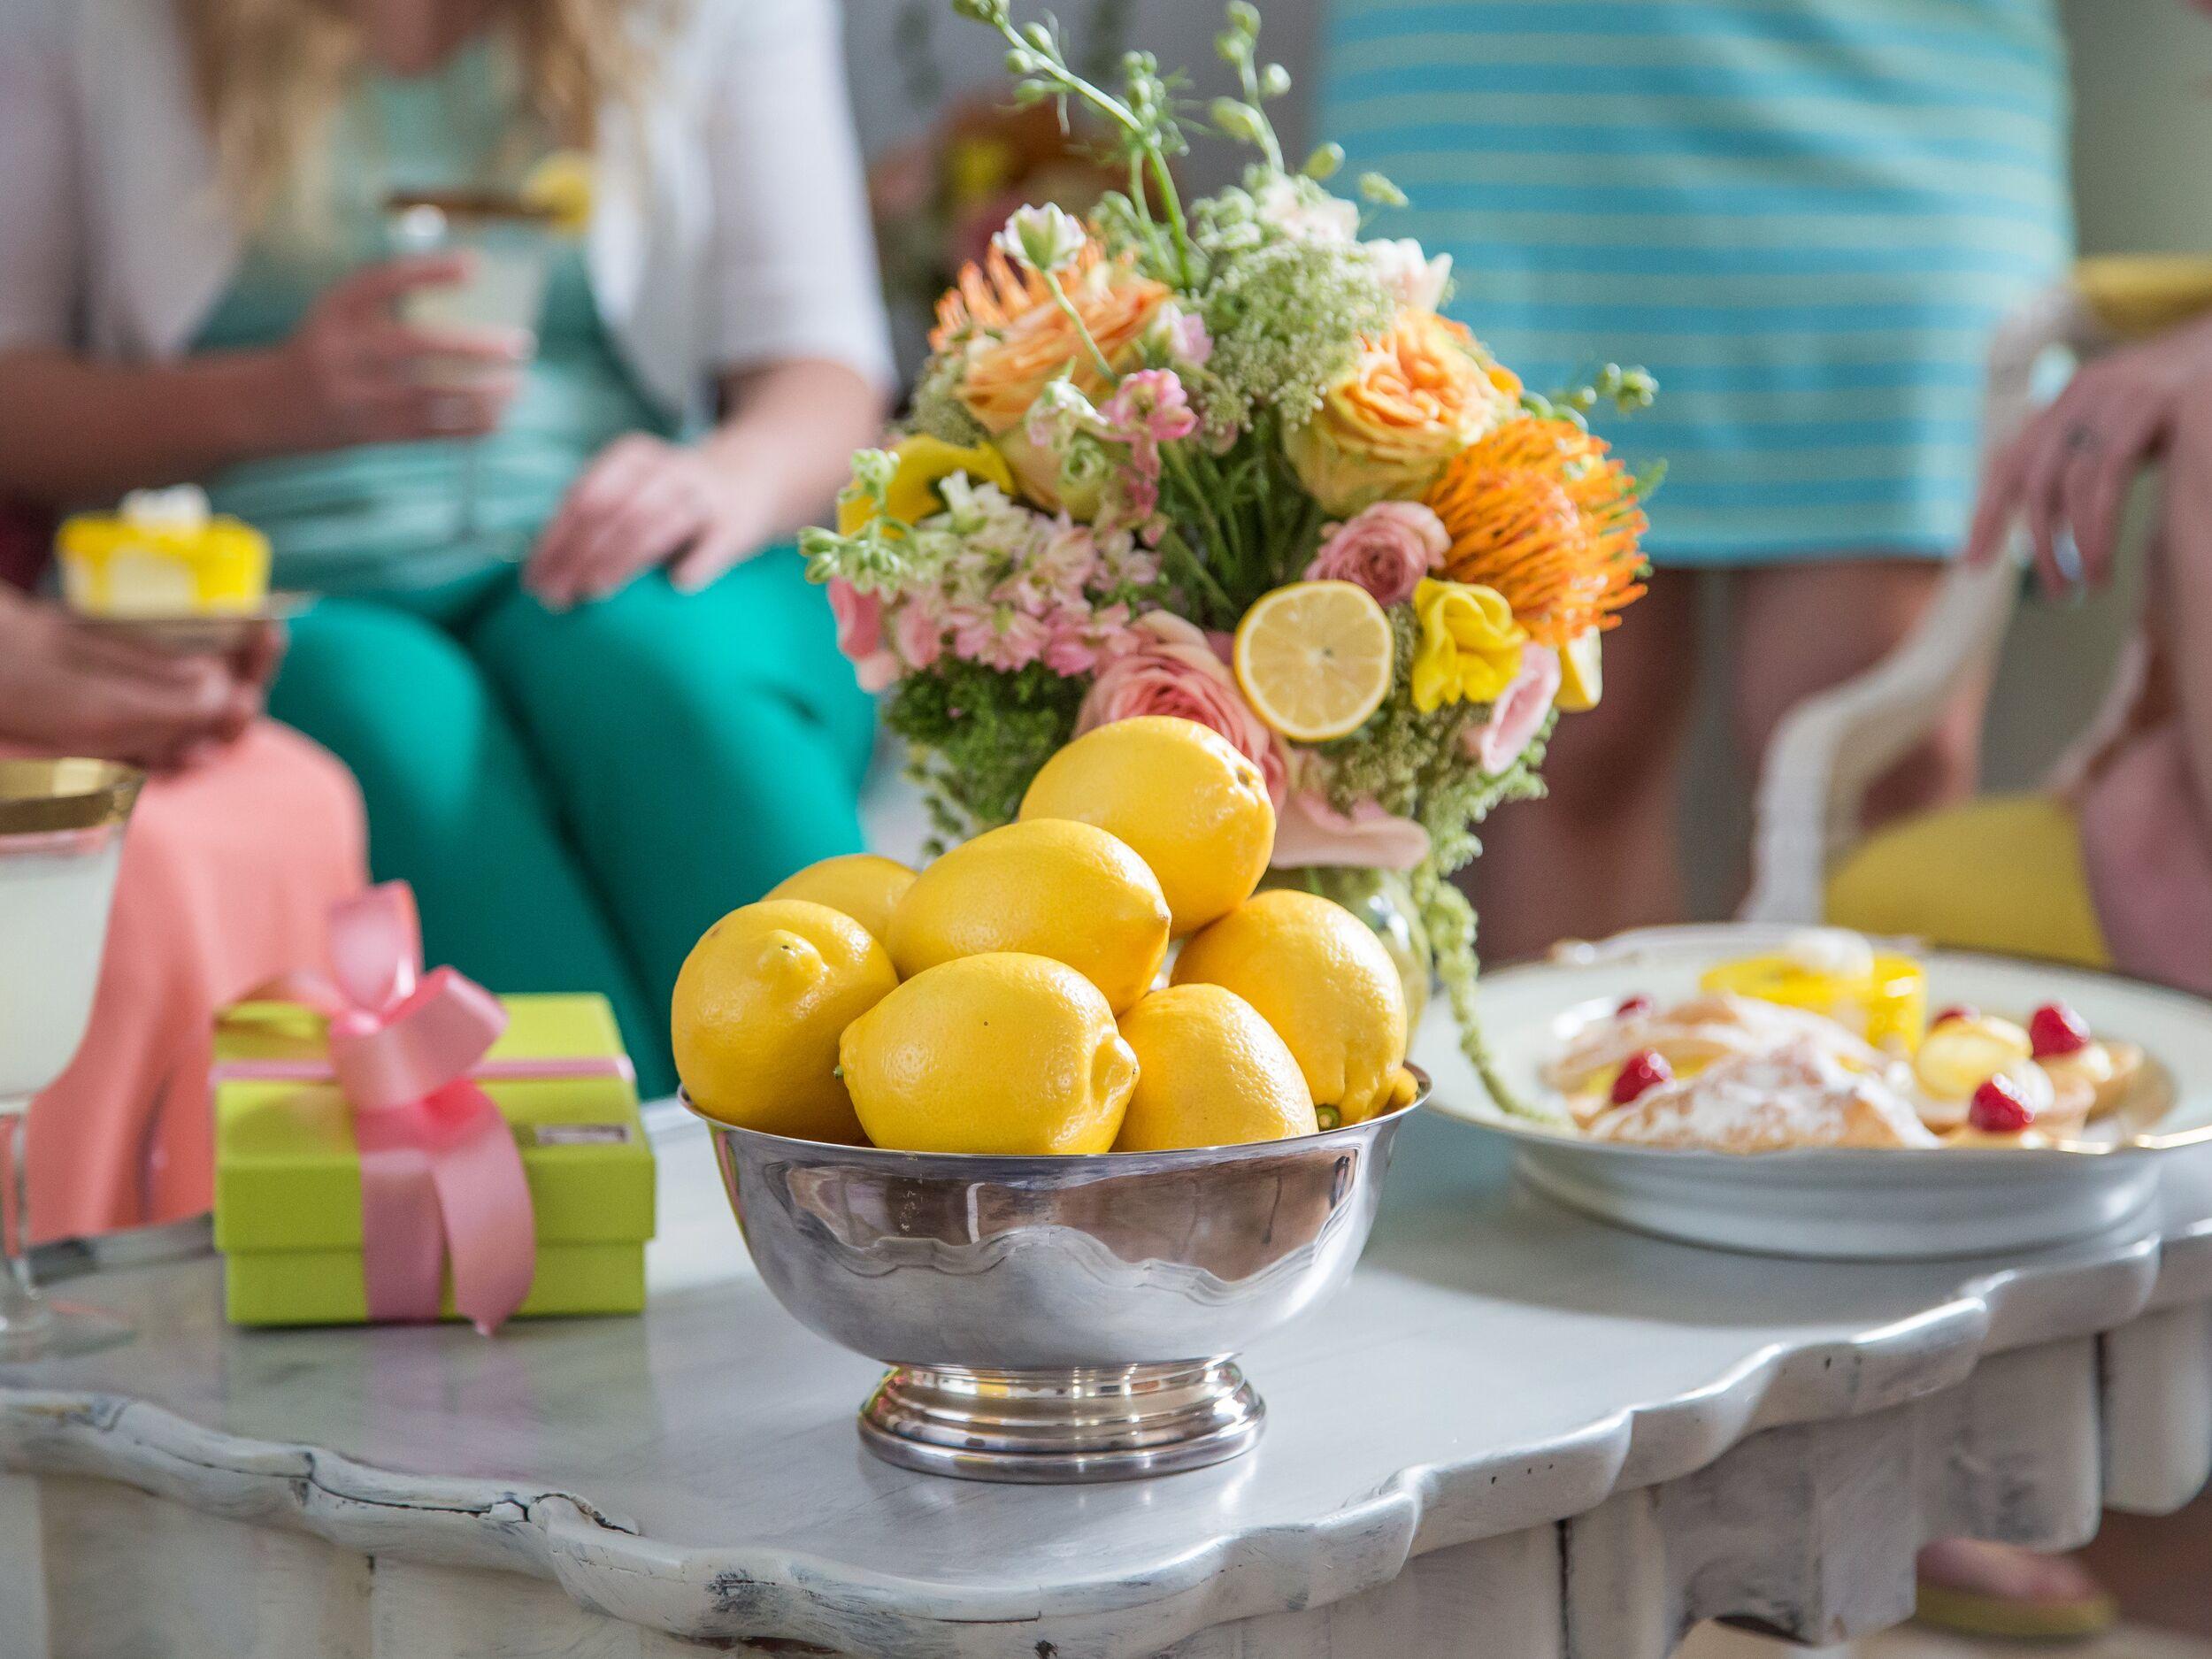 Конкурс на свадьбе с лимоном